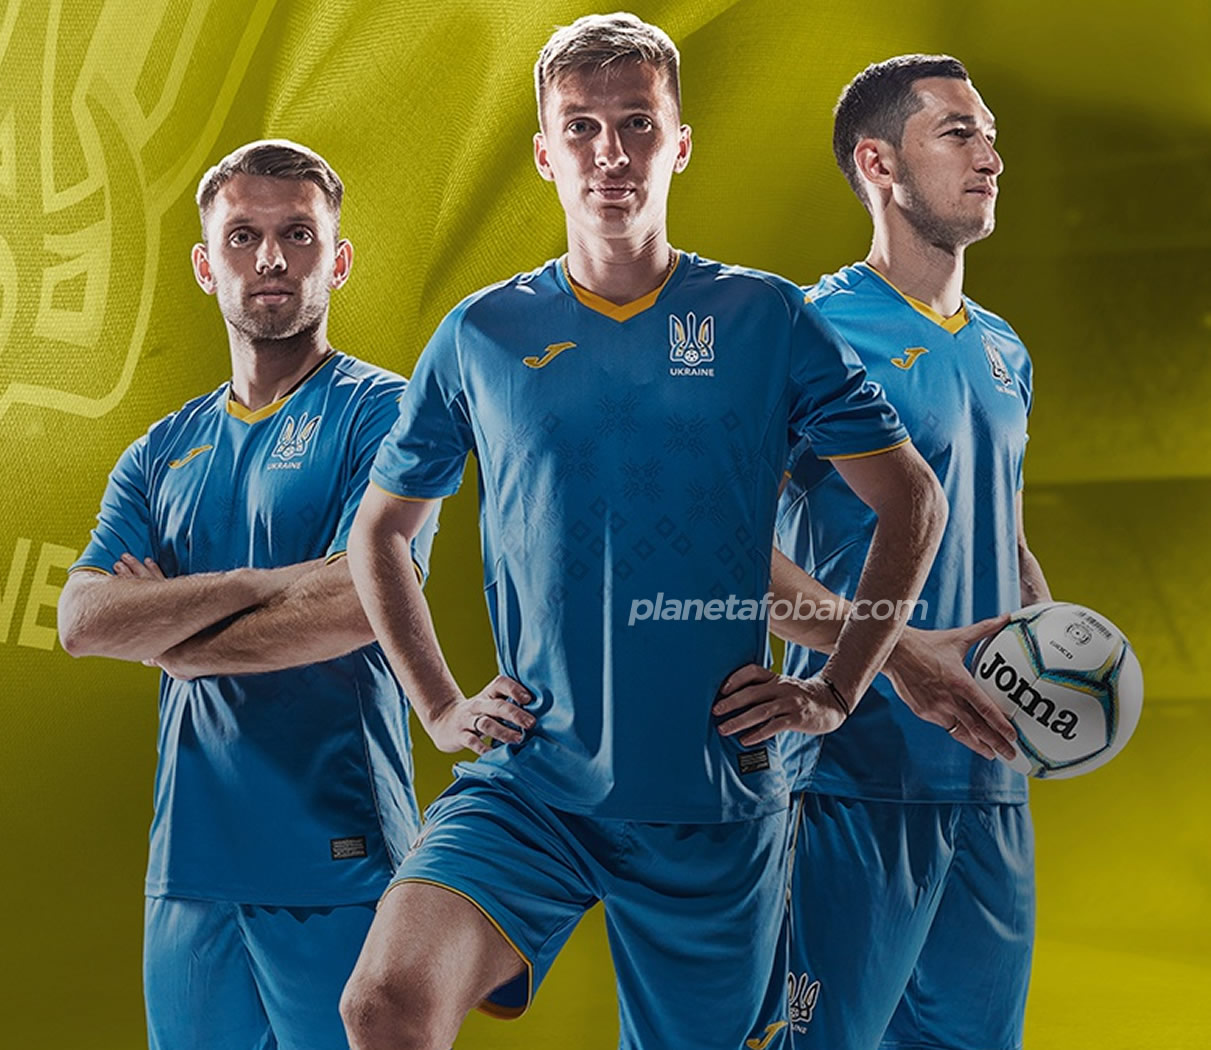 Camiseta suplente Joma de Ucrania 2020/21 | Imagen FFU